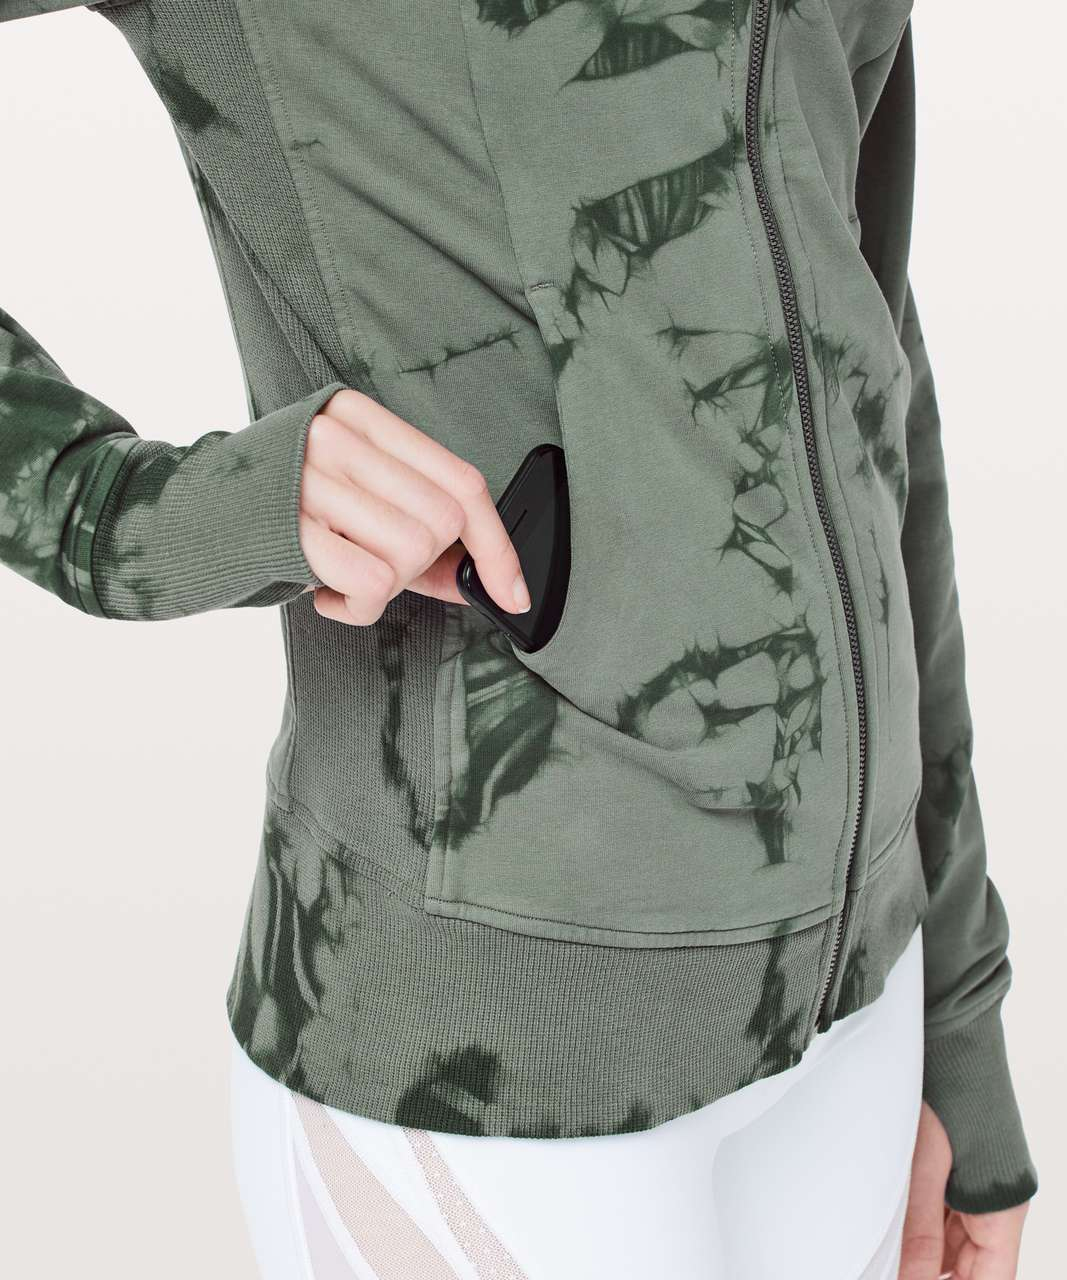 Lululemon Scuba Hoodie *Light Cotton Fleece Shibori - Shibori Misty Meadow Deep Ivy